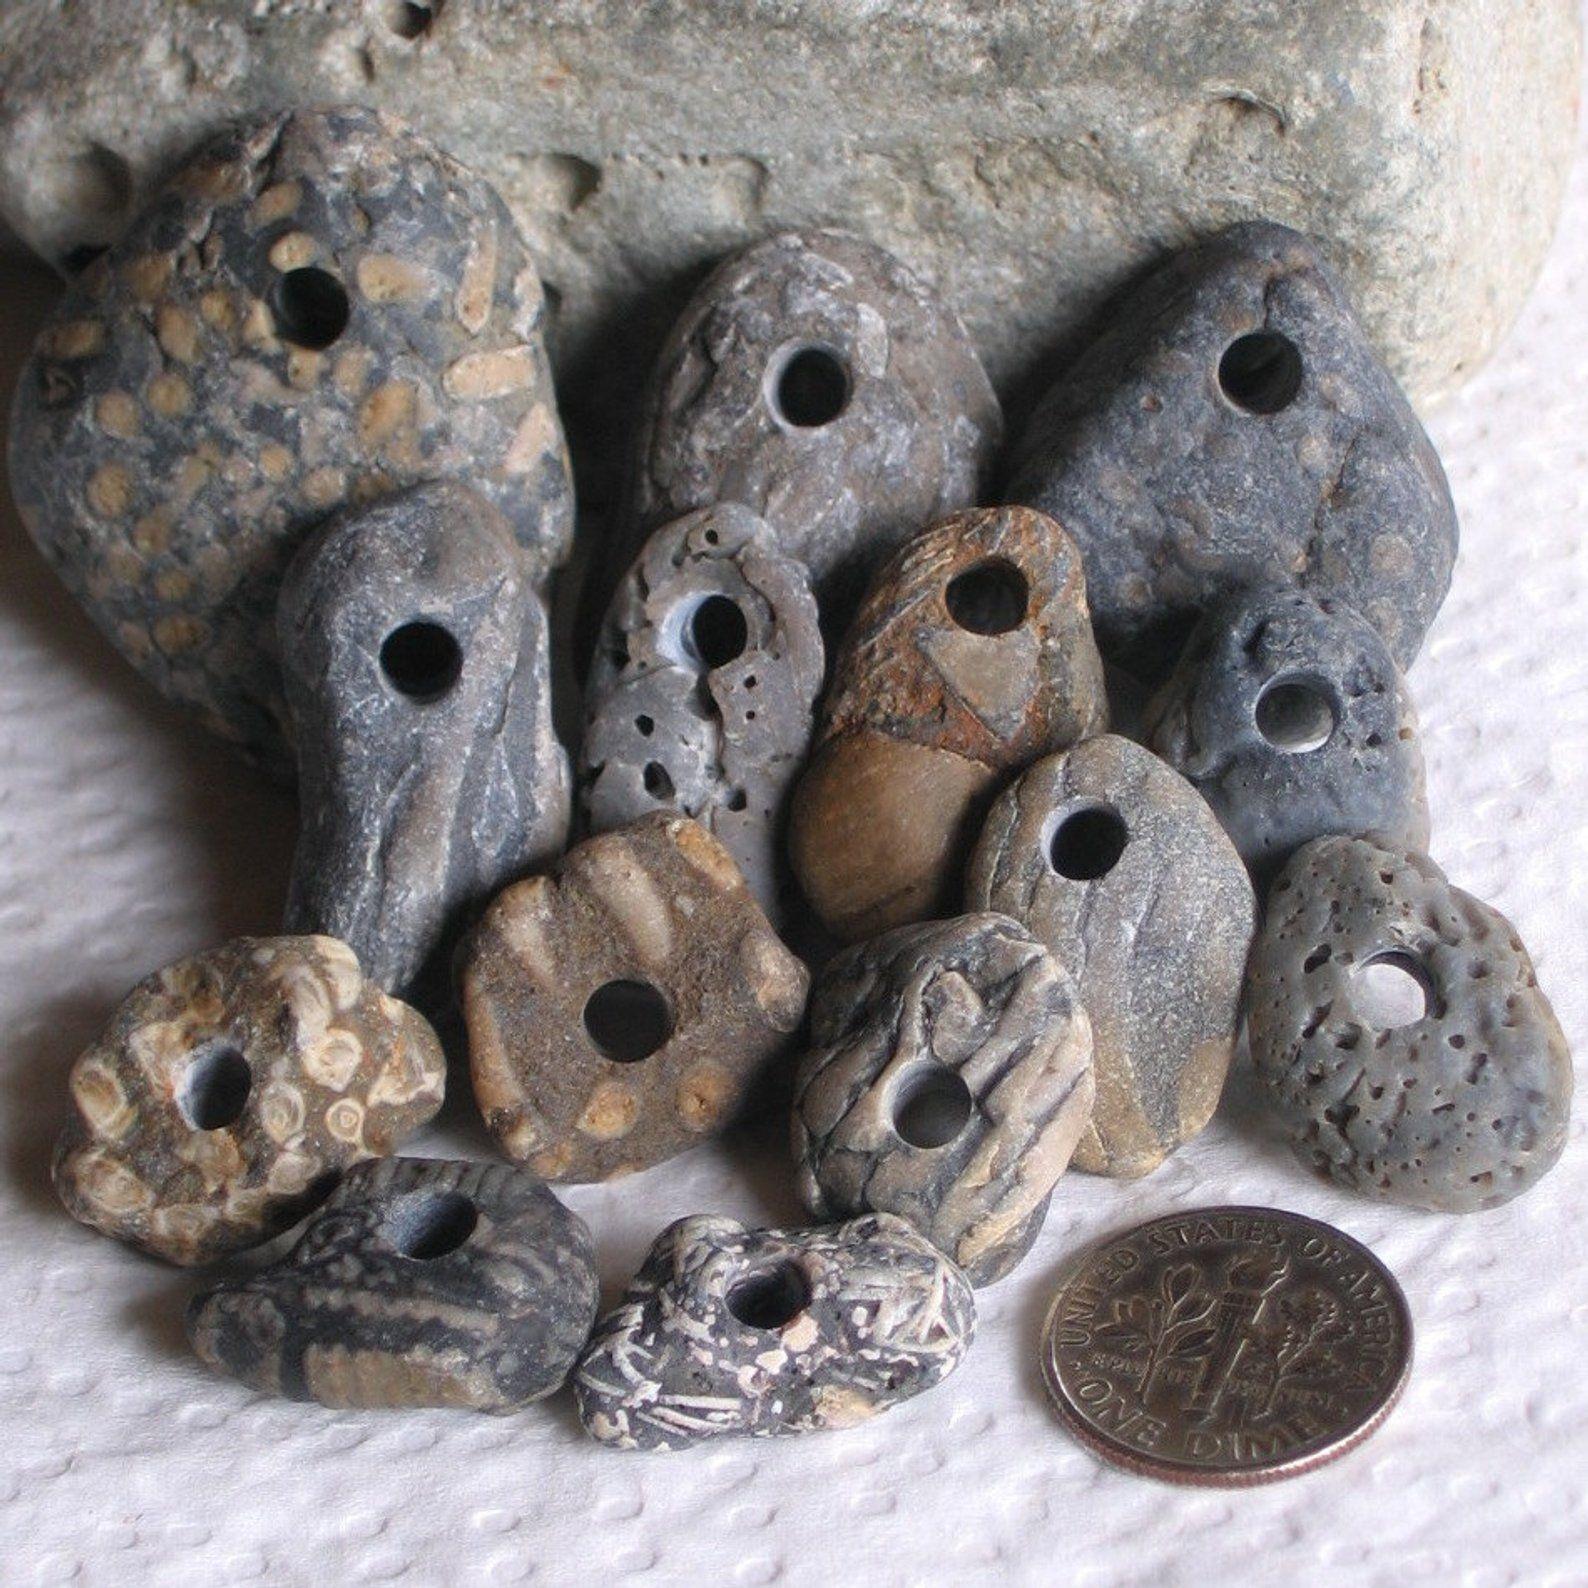 Natural Art Surf Shop: 14 Natural Surf Tumbled Fossils Drilled 4mm Holes Supplies